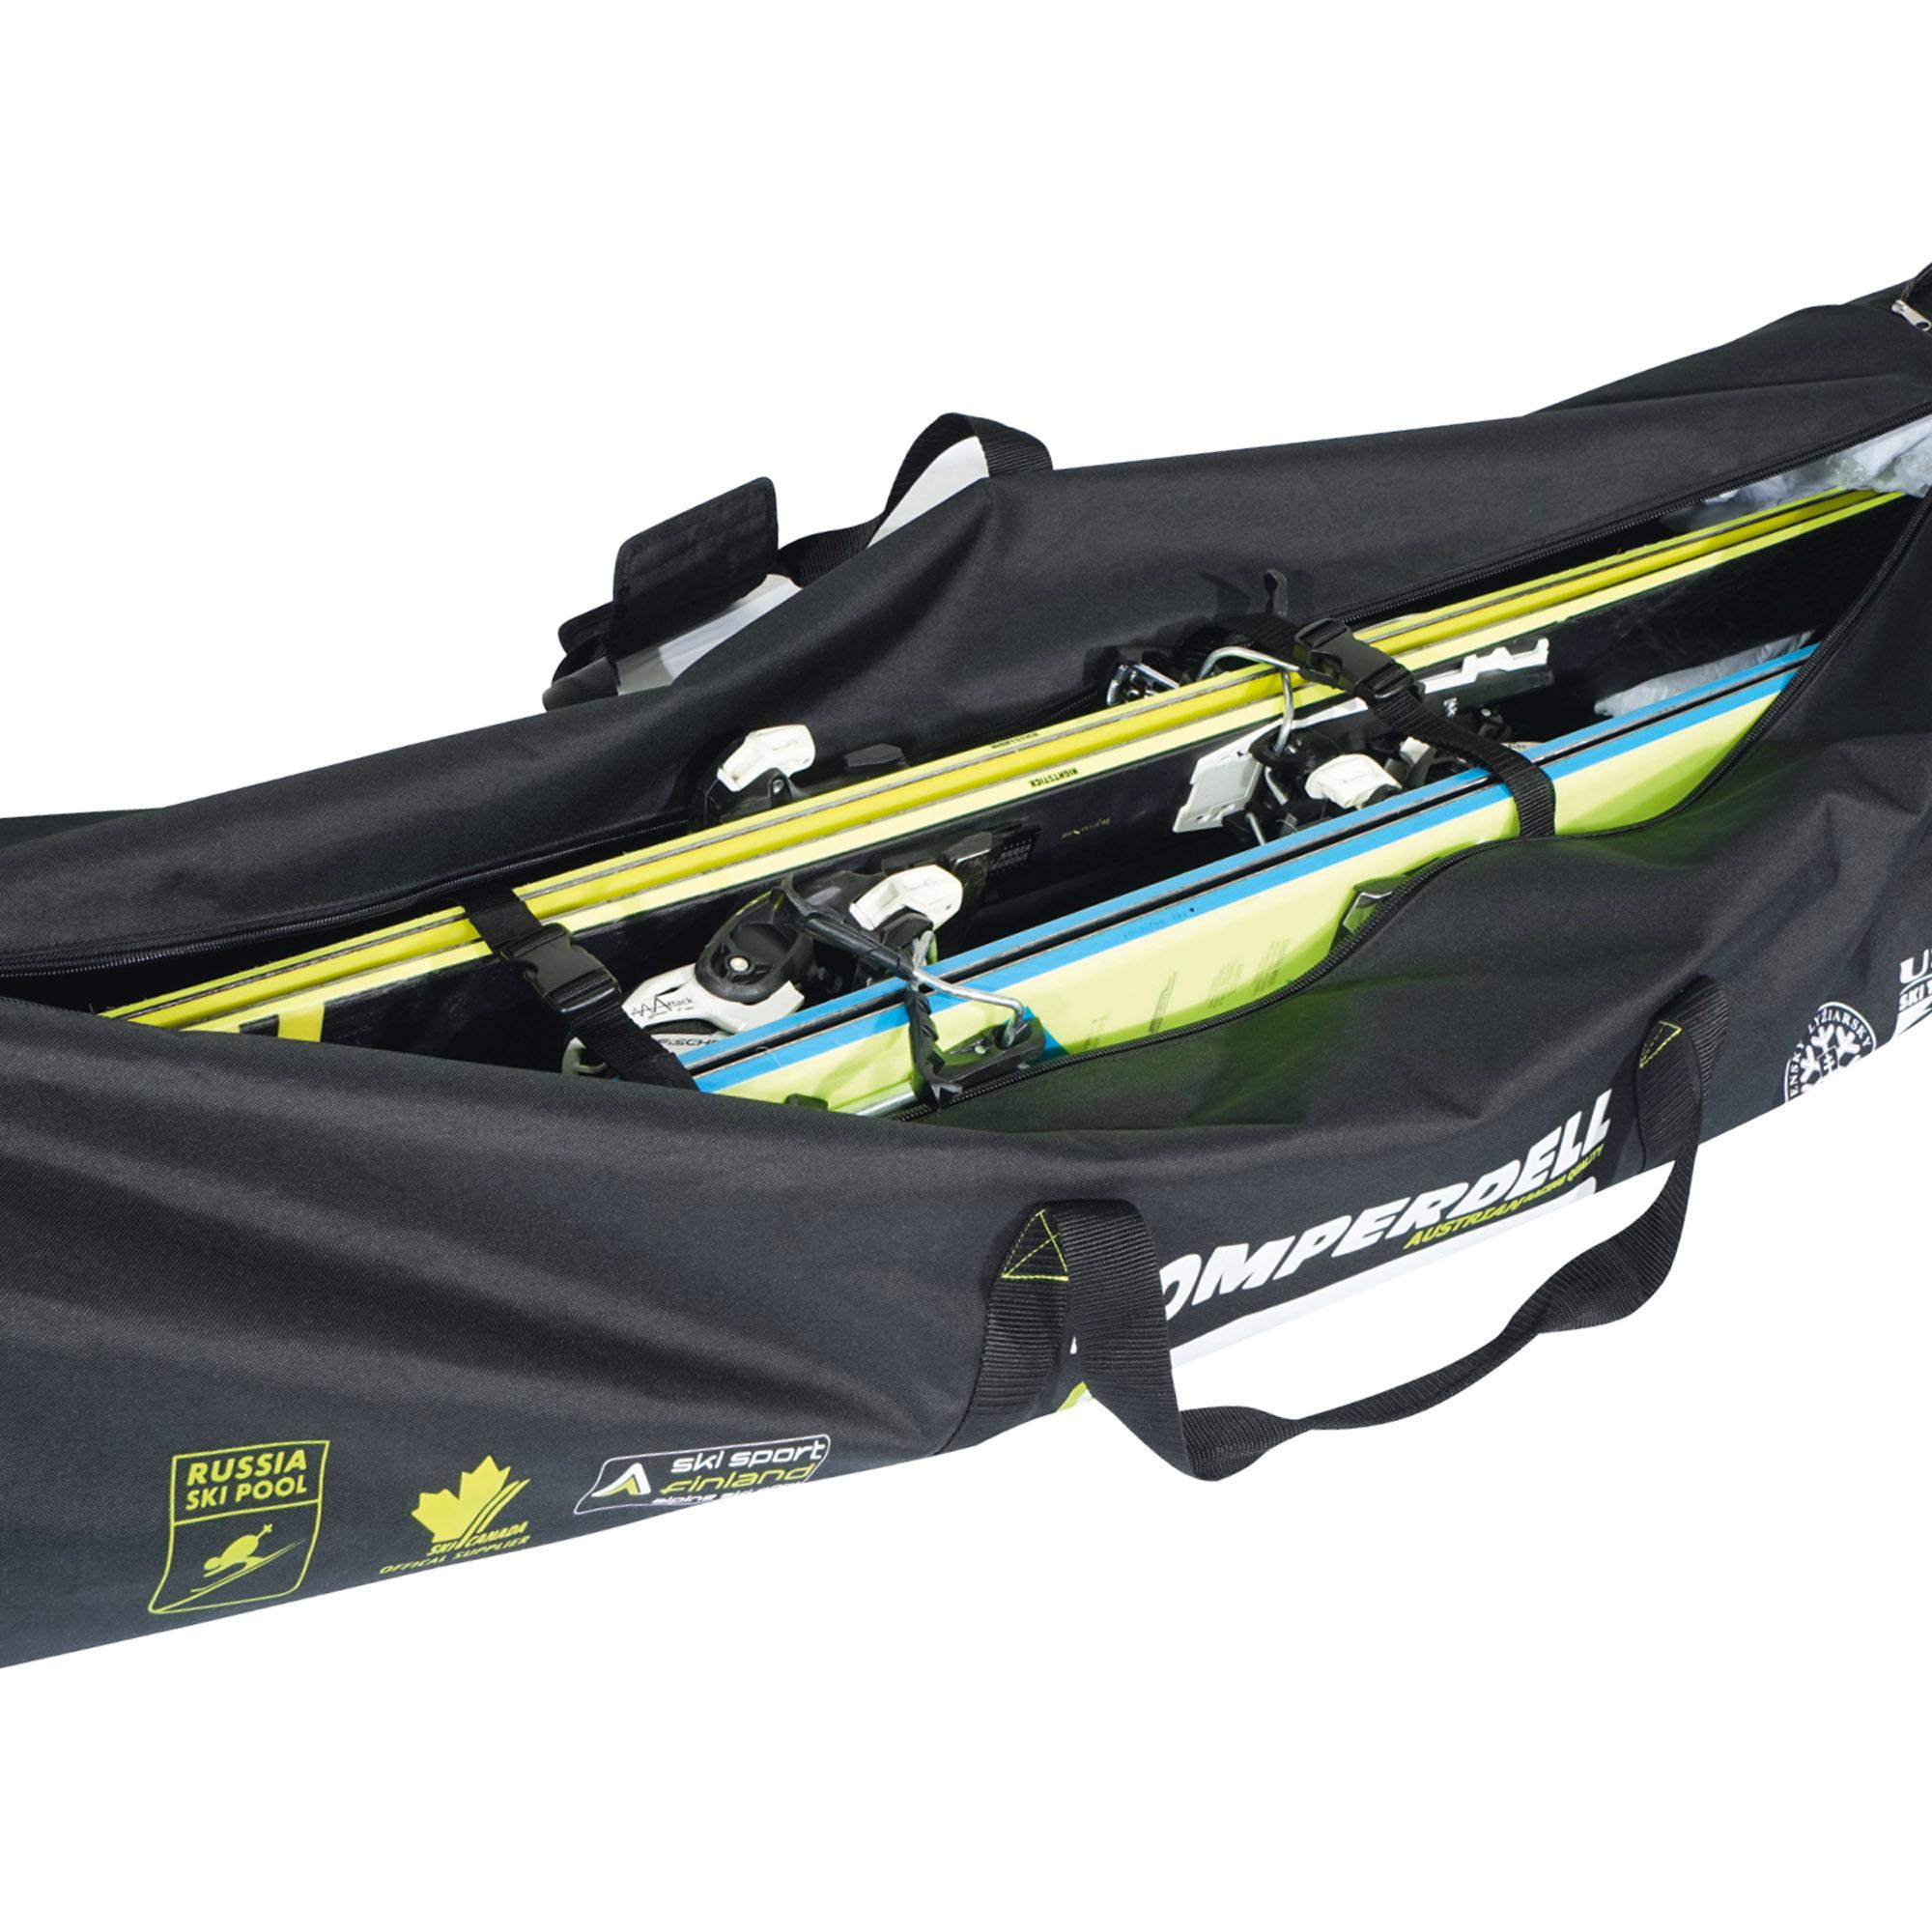 Nationalteam Expandable Pole and Ski Bag